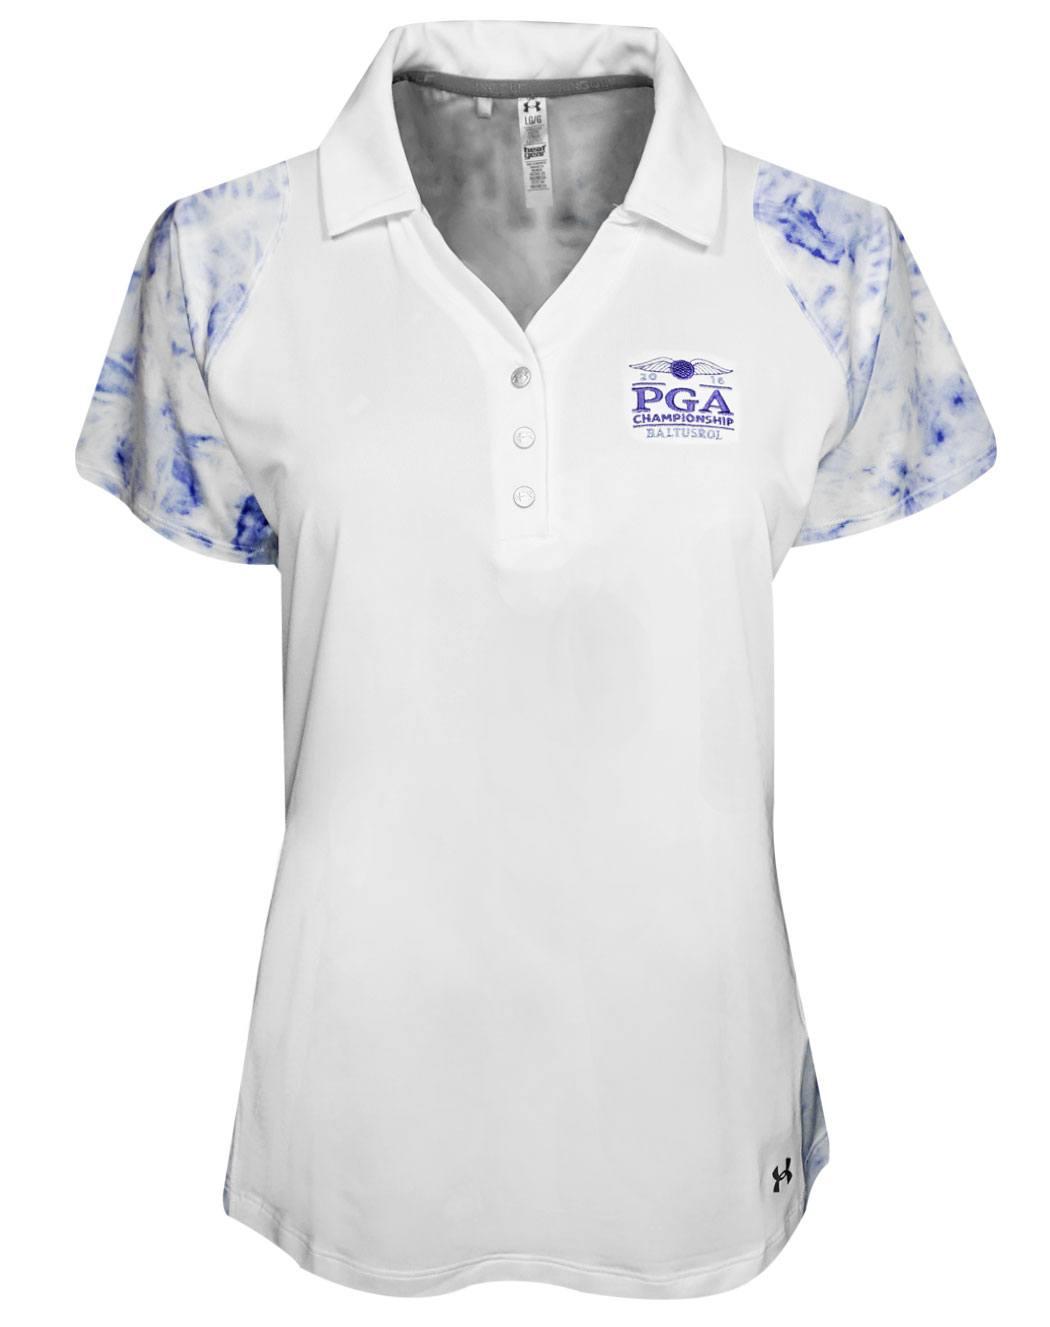 Under Armour Golf- Ladies 2016 PGA Championship Fashion Polo